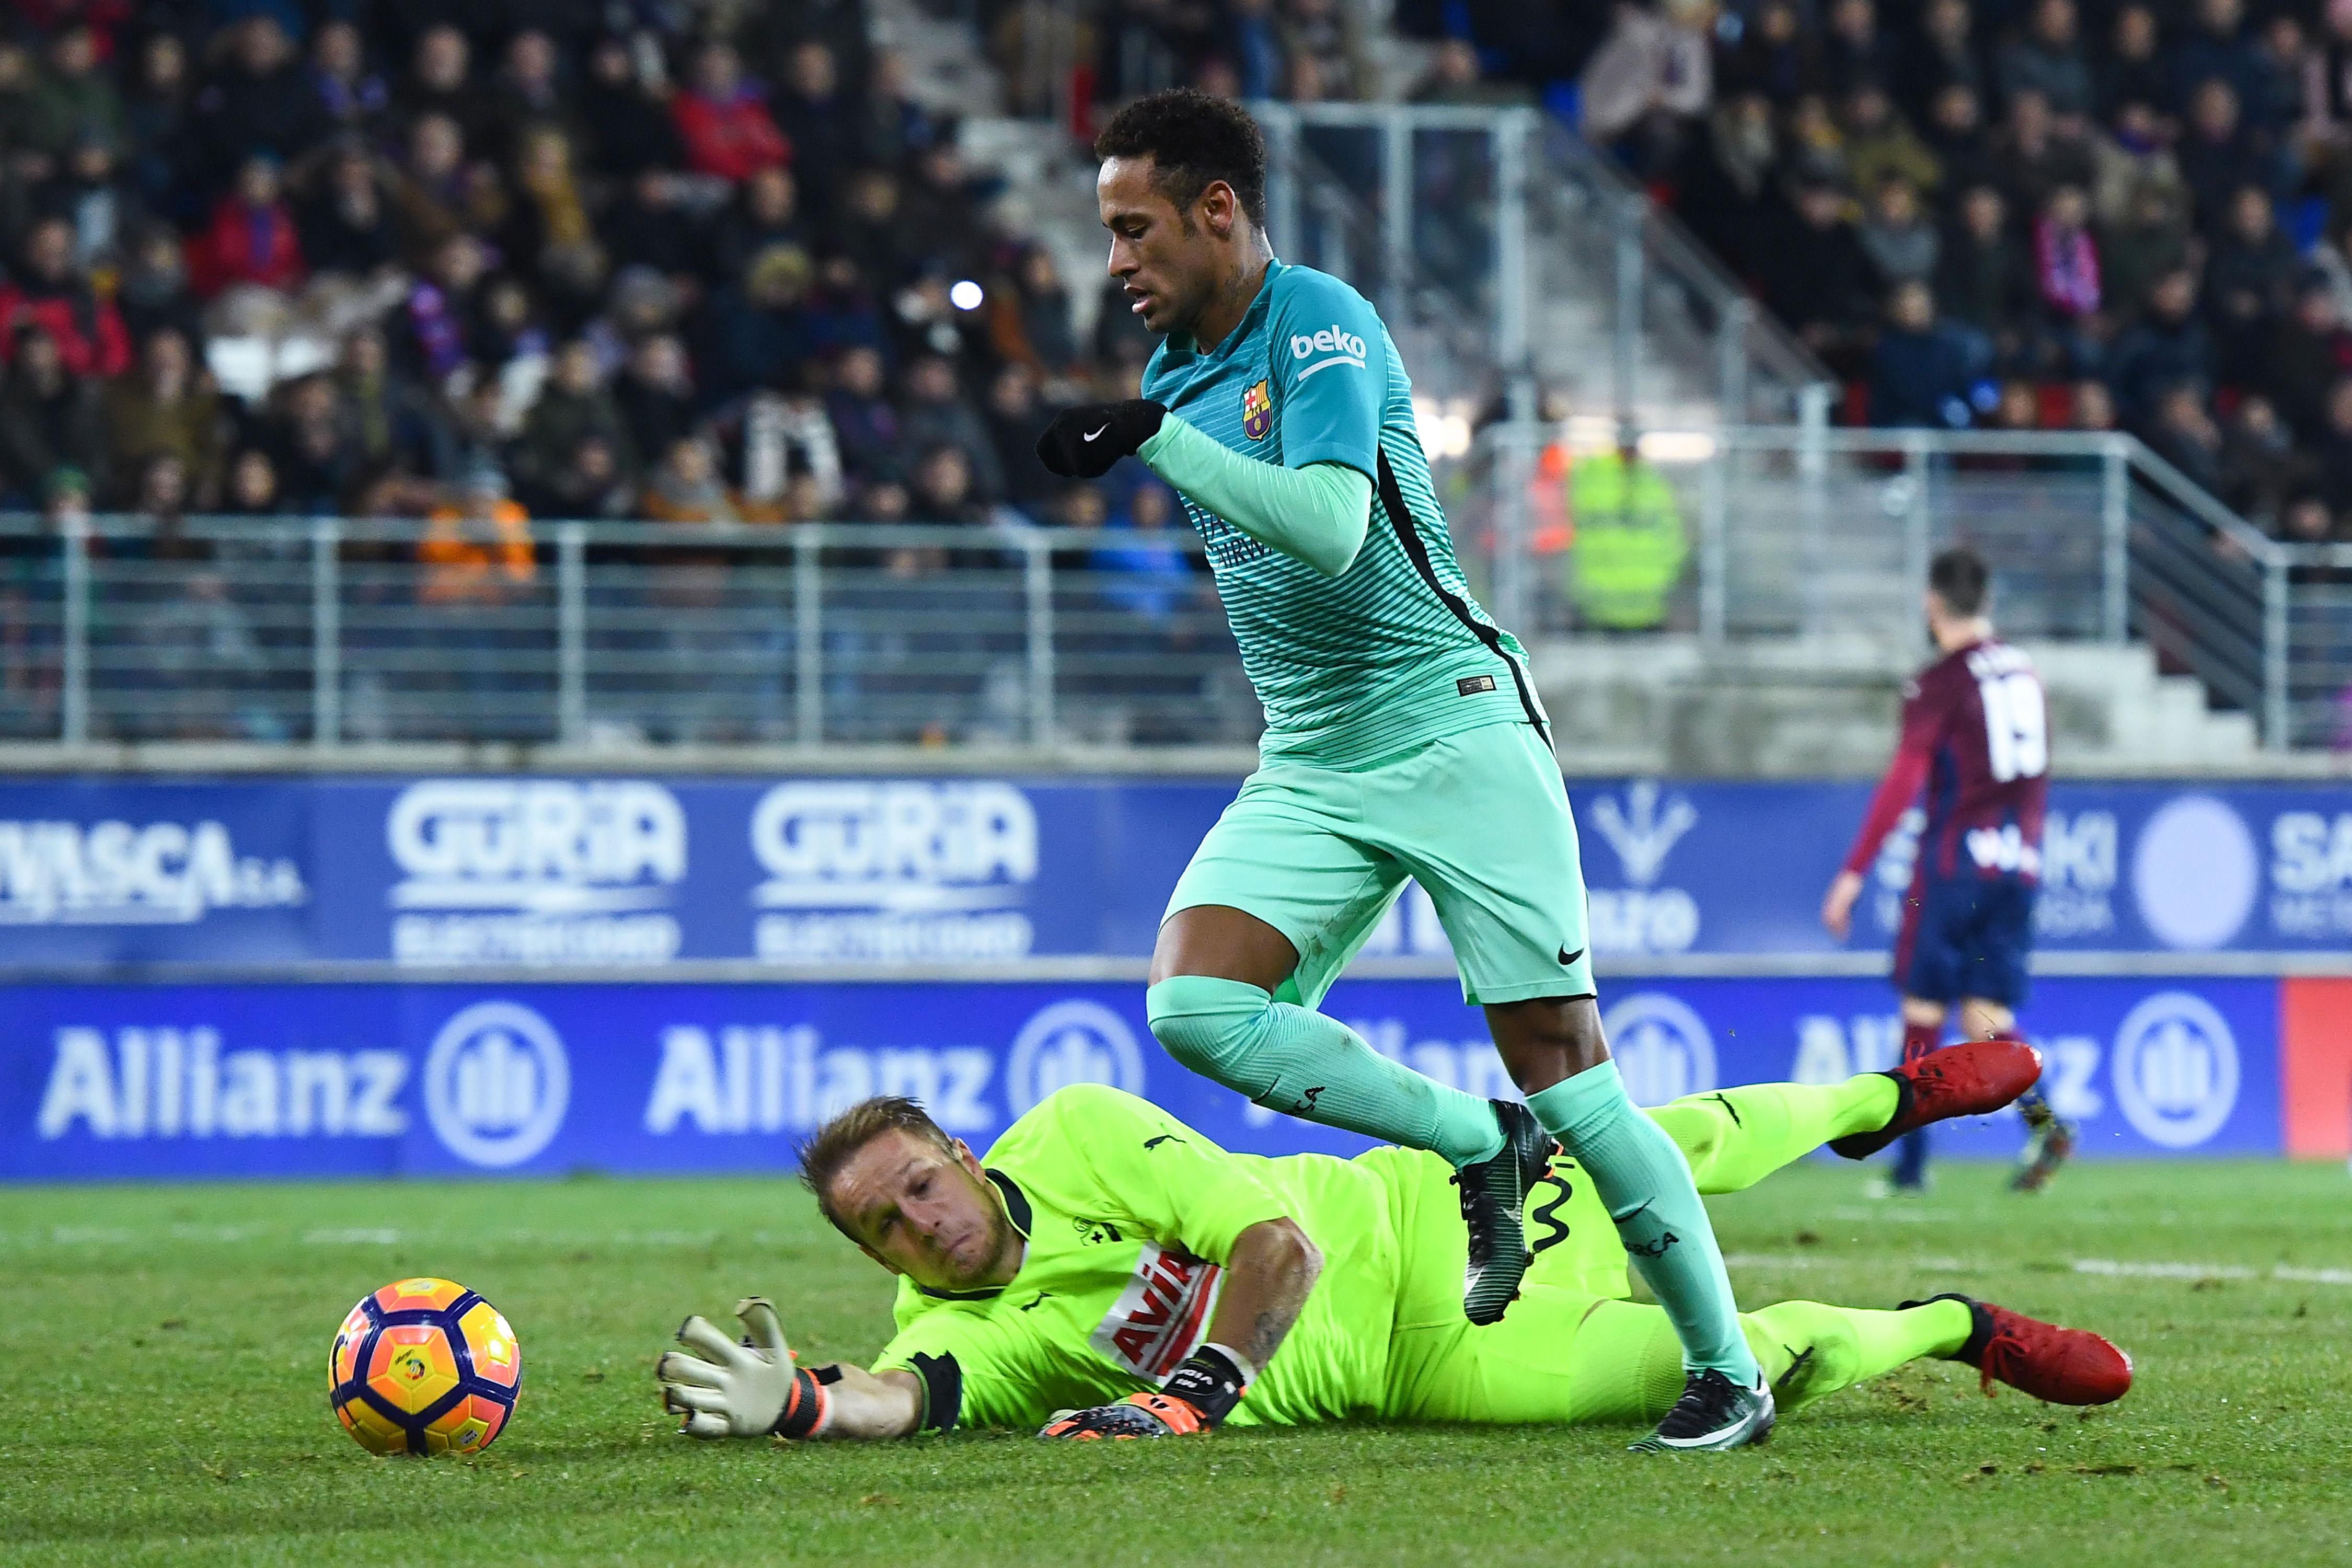 Месси стал лучшим бомбардиром чемпионата Испании, Роналду— третий